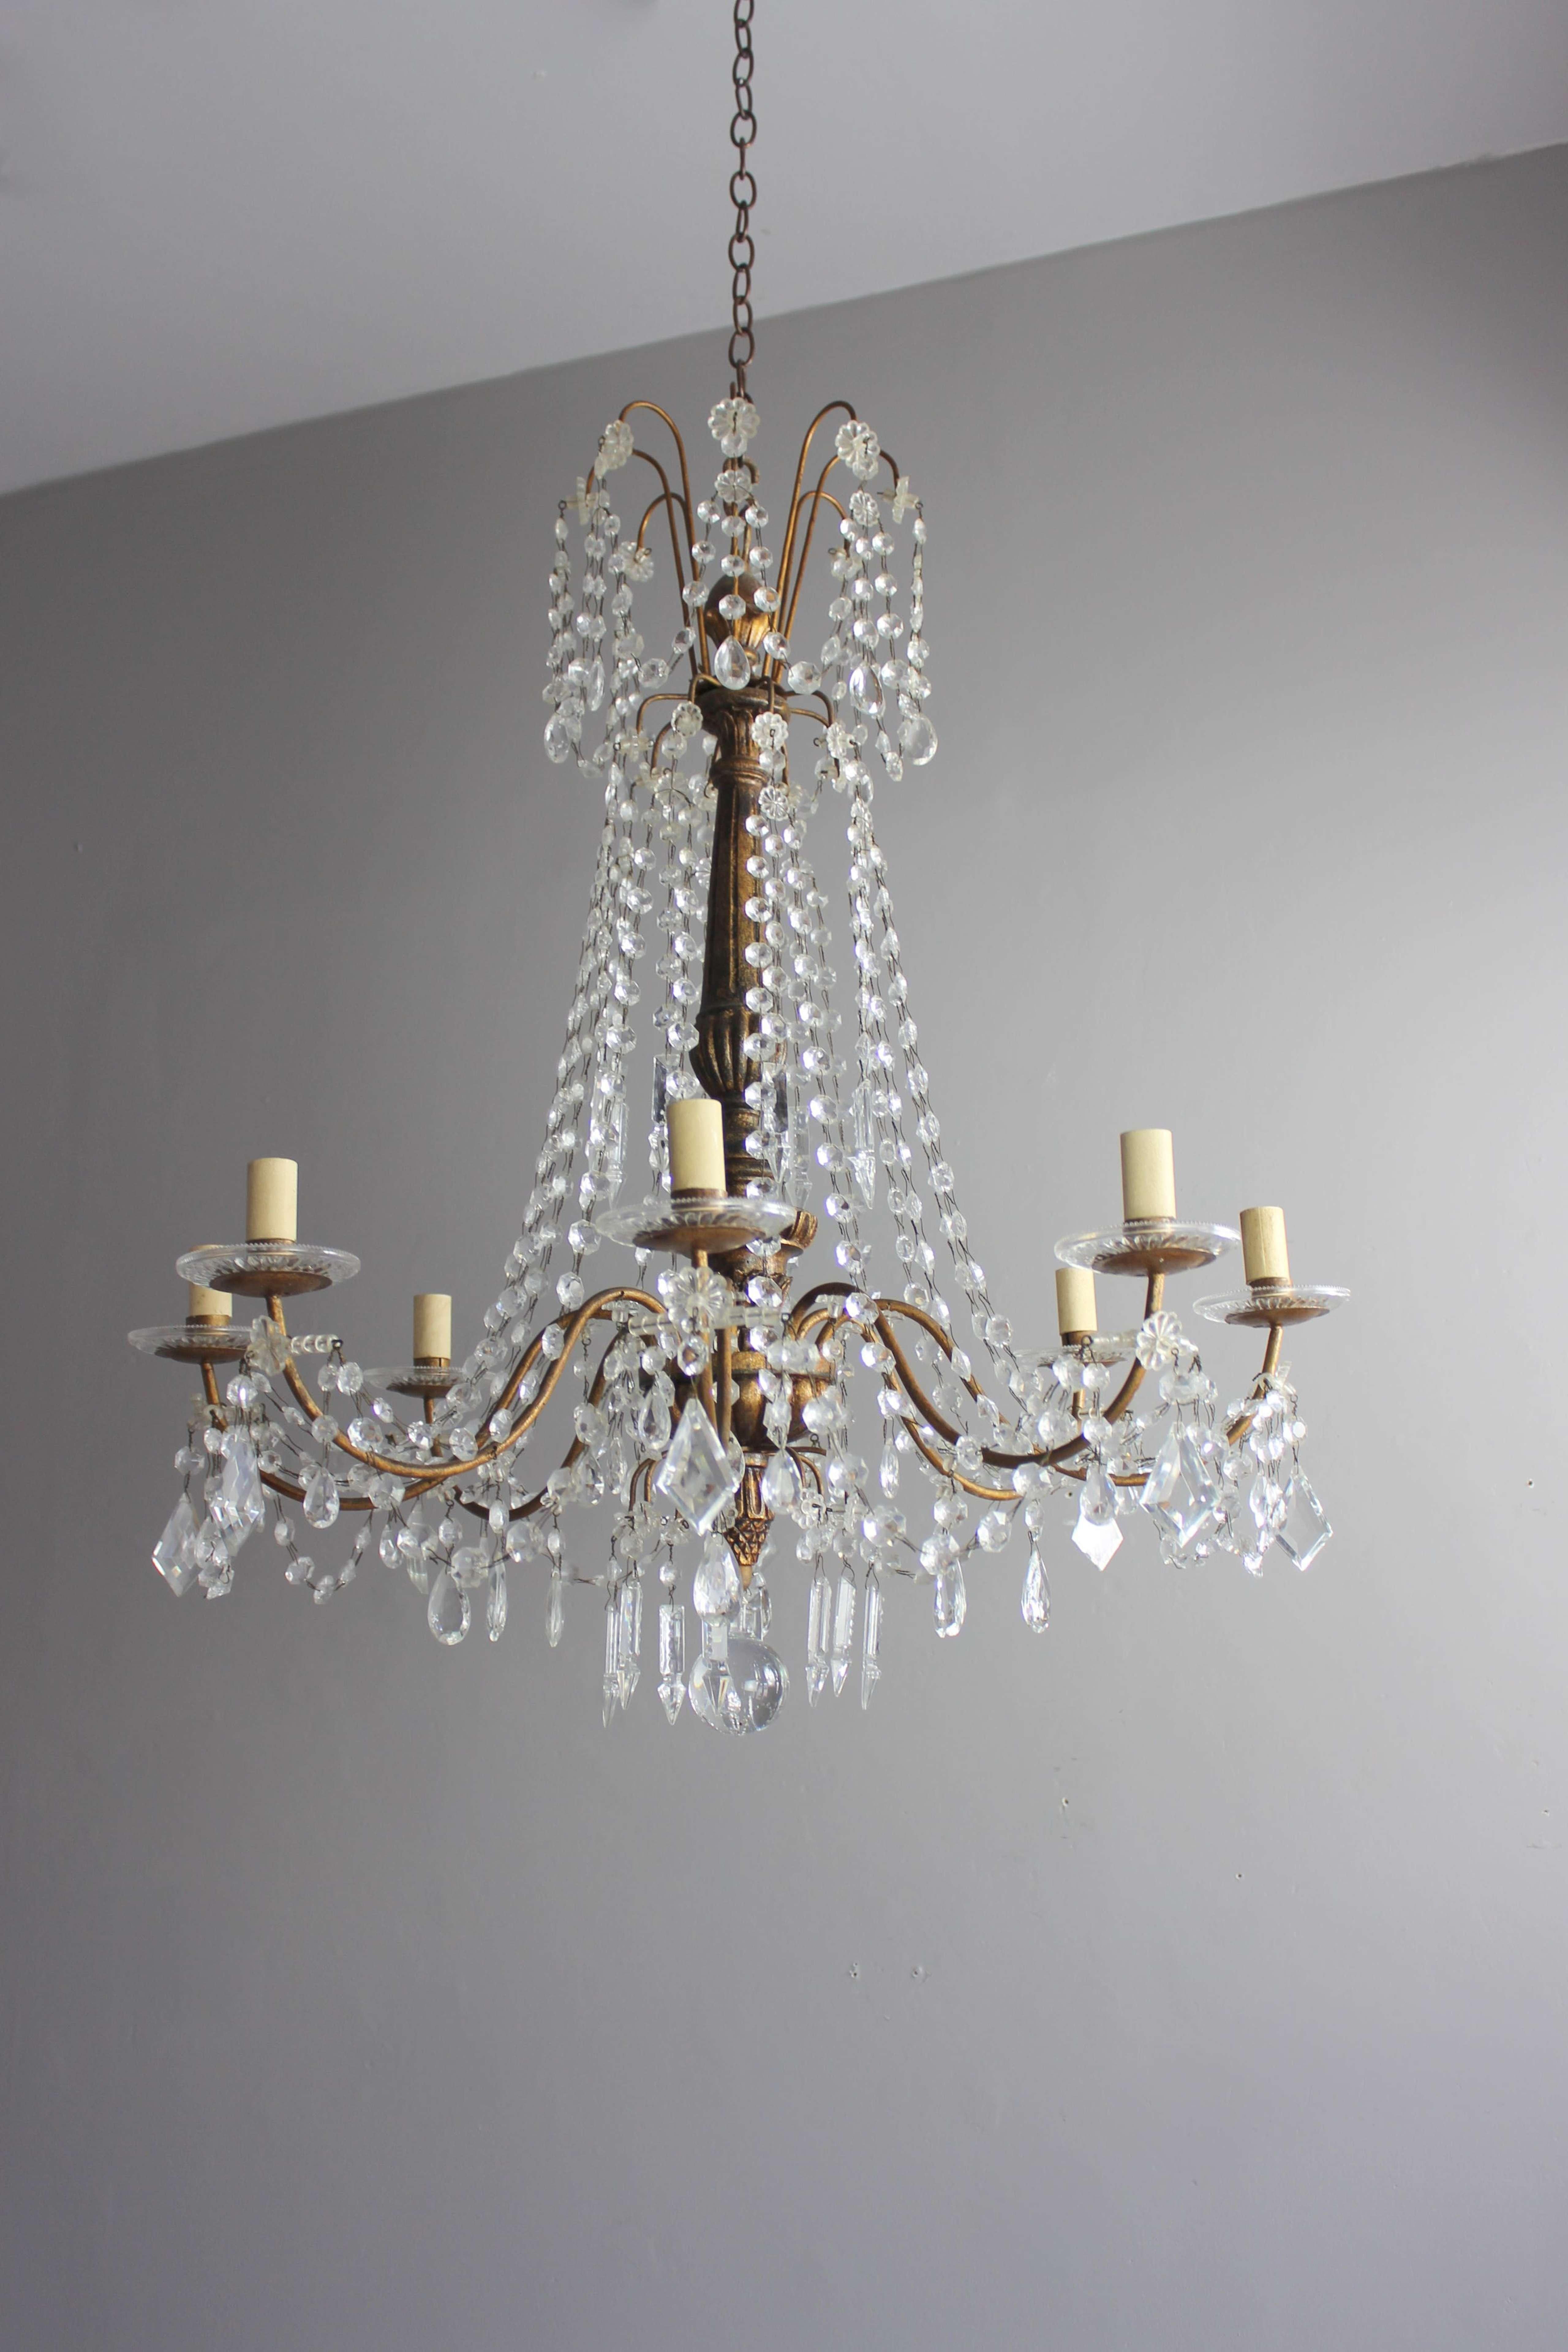 Italian antique chandelier in the Genoese style